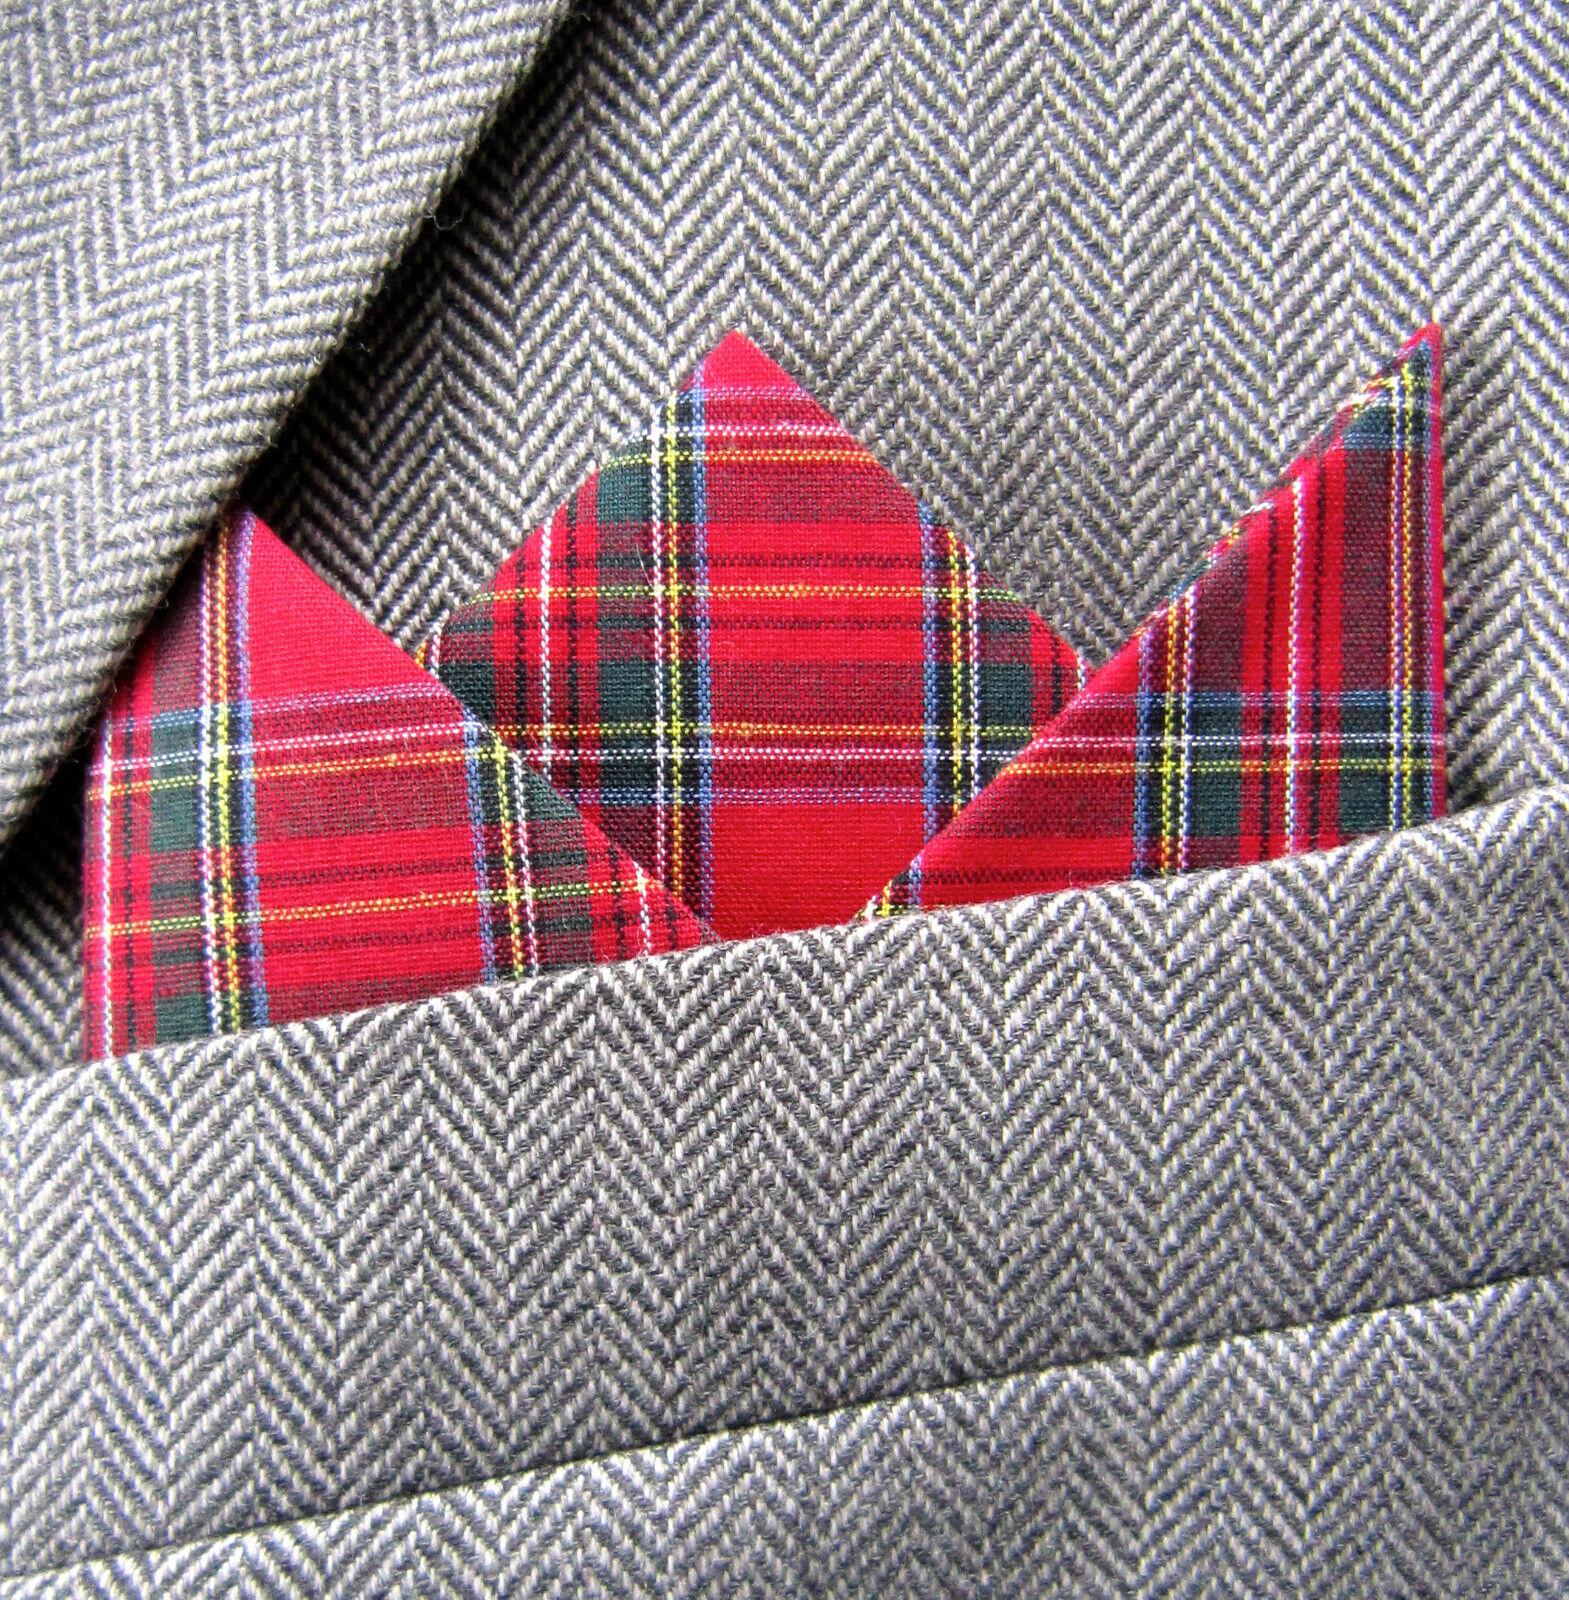 SUPERNOVA Red Stewart Tartan Check 3 Point Carded Pocket Handkerchief Mod